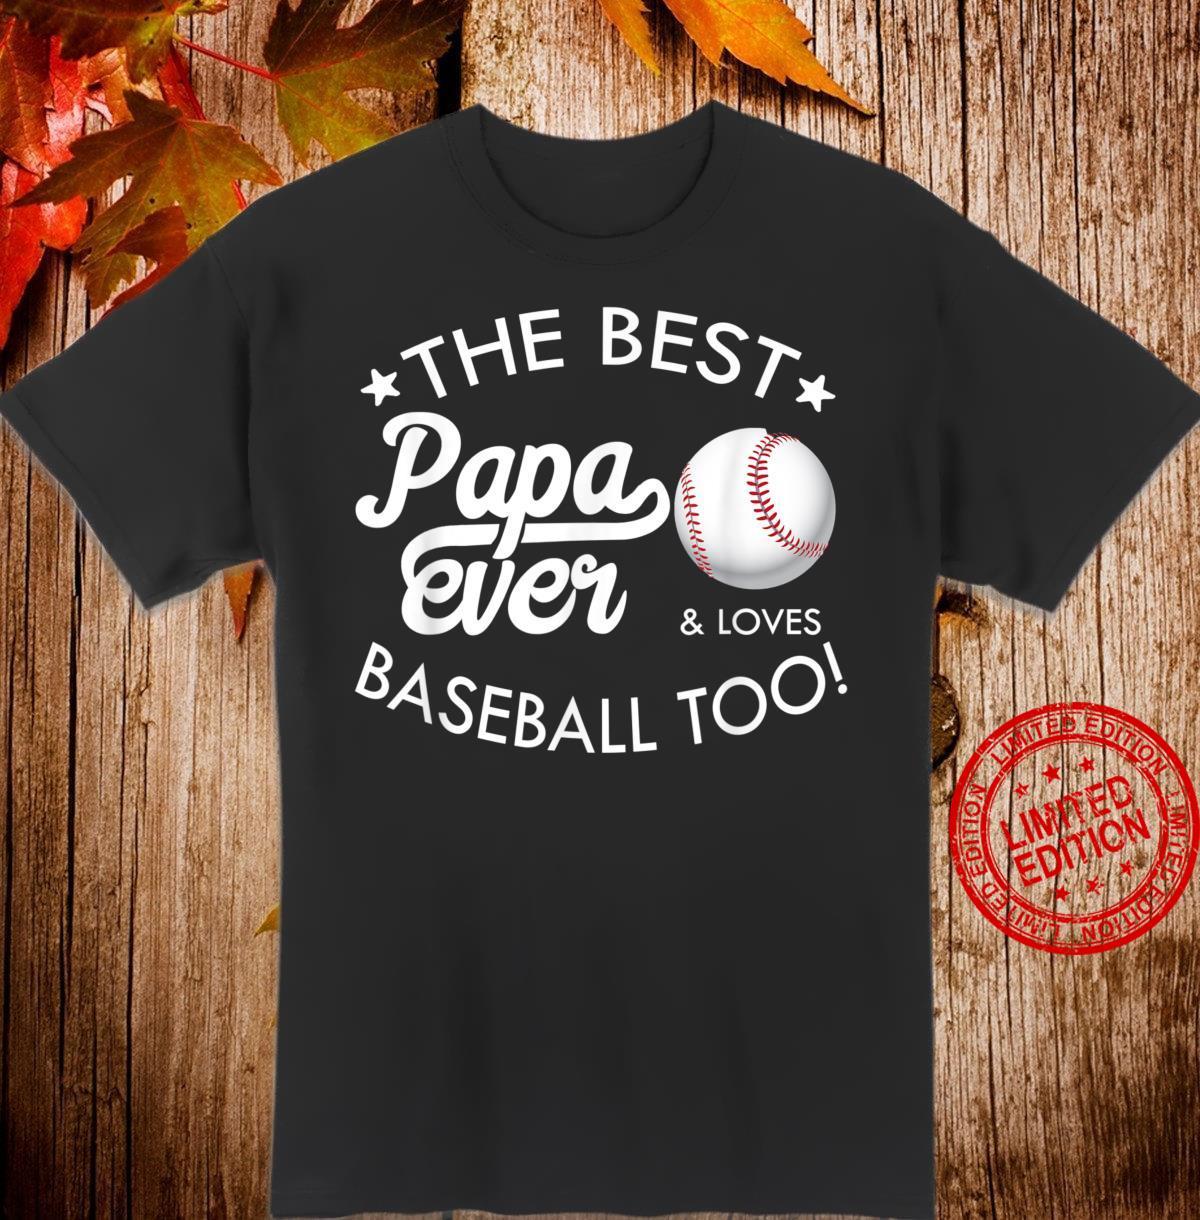 Mens Best Papa Ever, Baseball Shirt